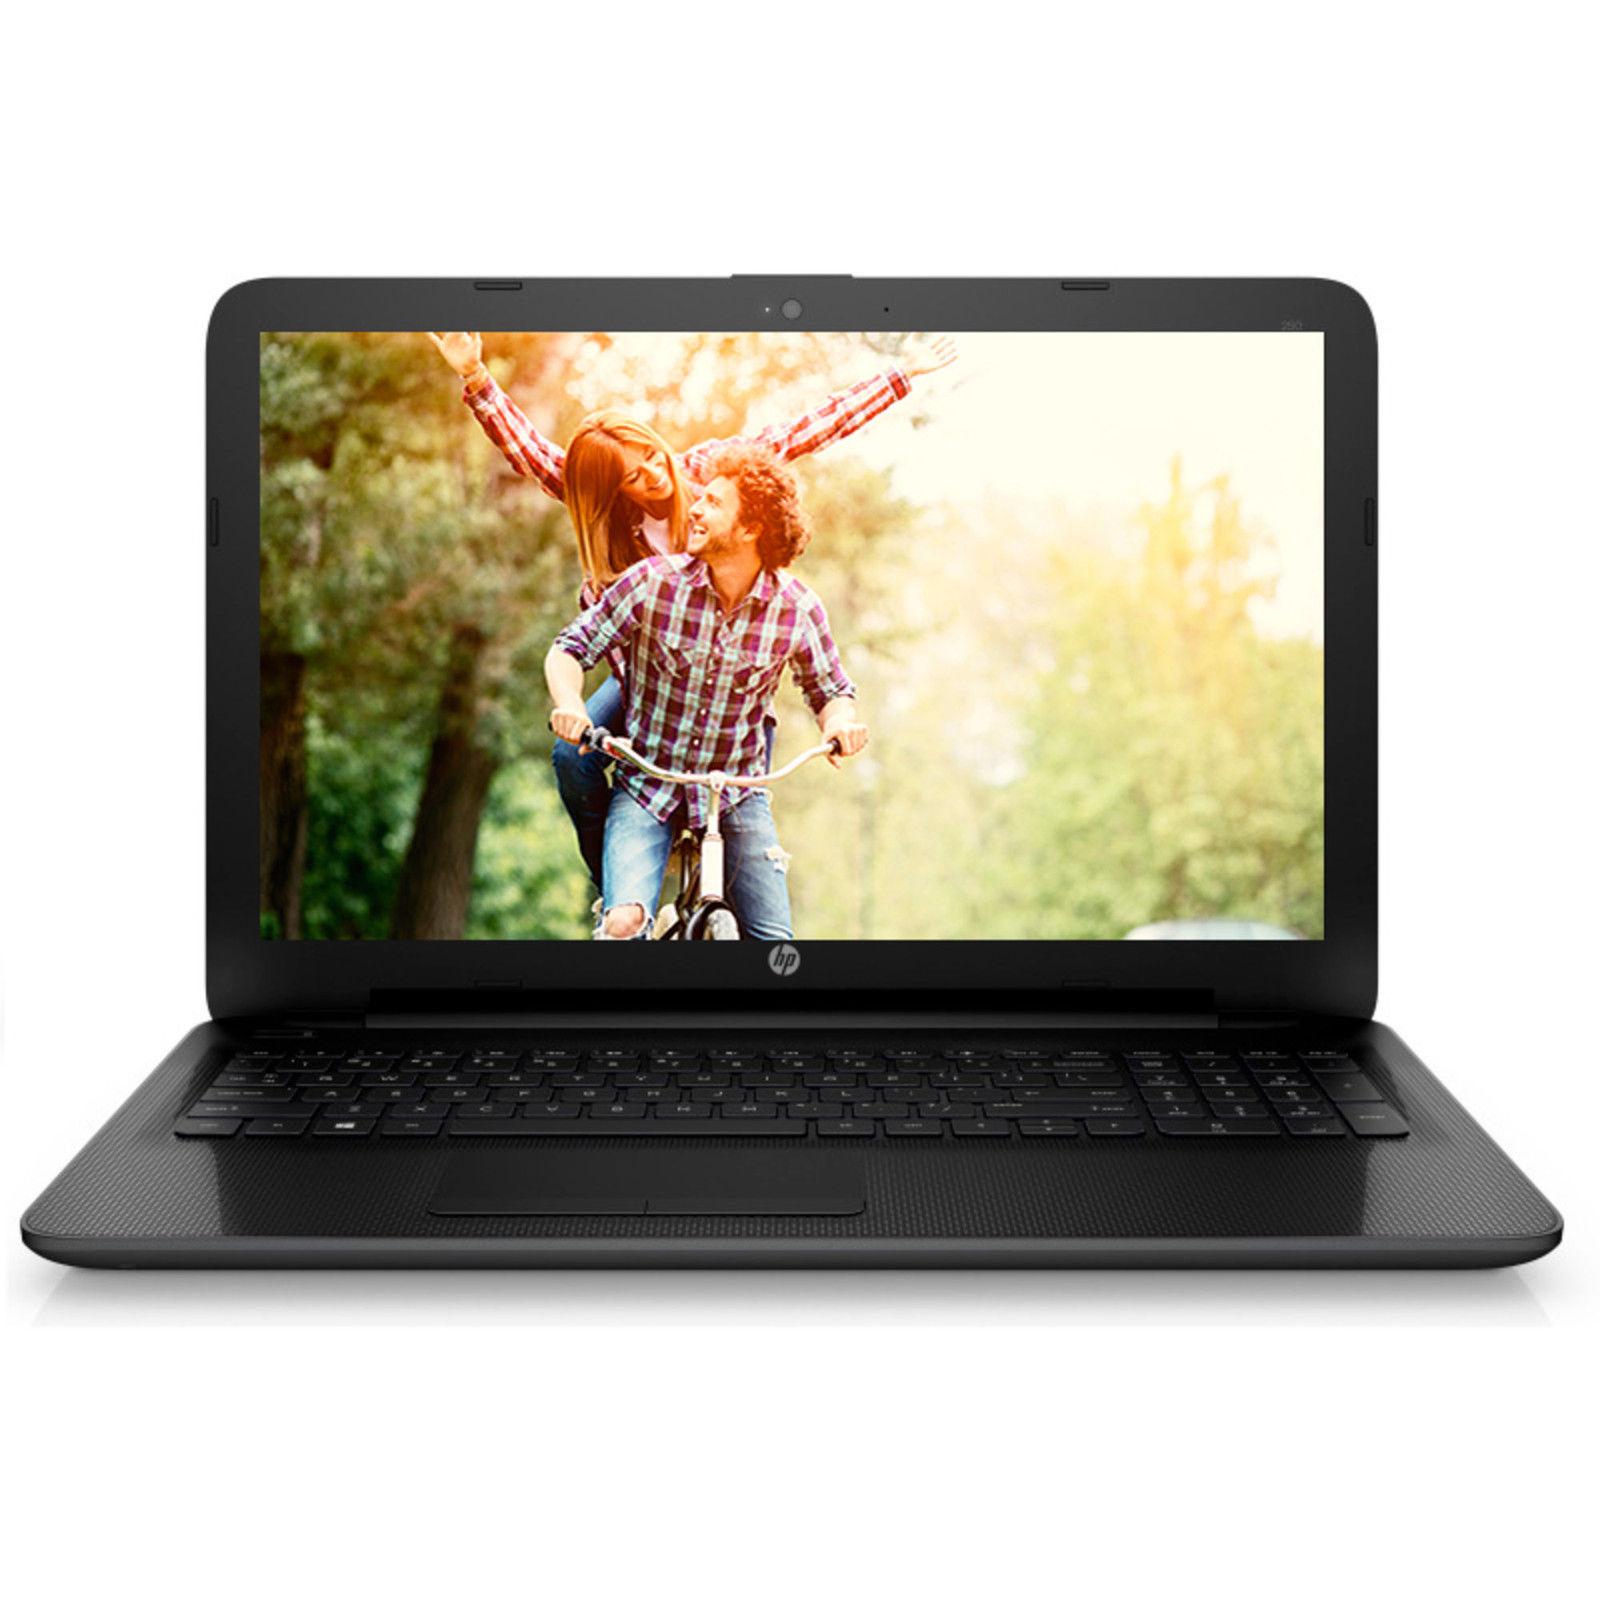 HP Notebook - AMD Quad Core - 1000 GB - Windows 10 Pro - Office 2016 - Security